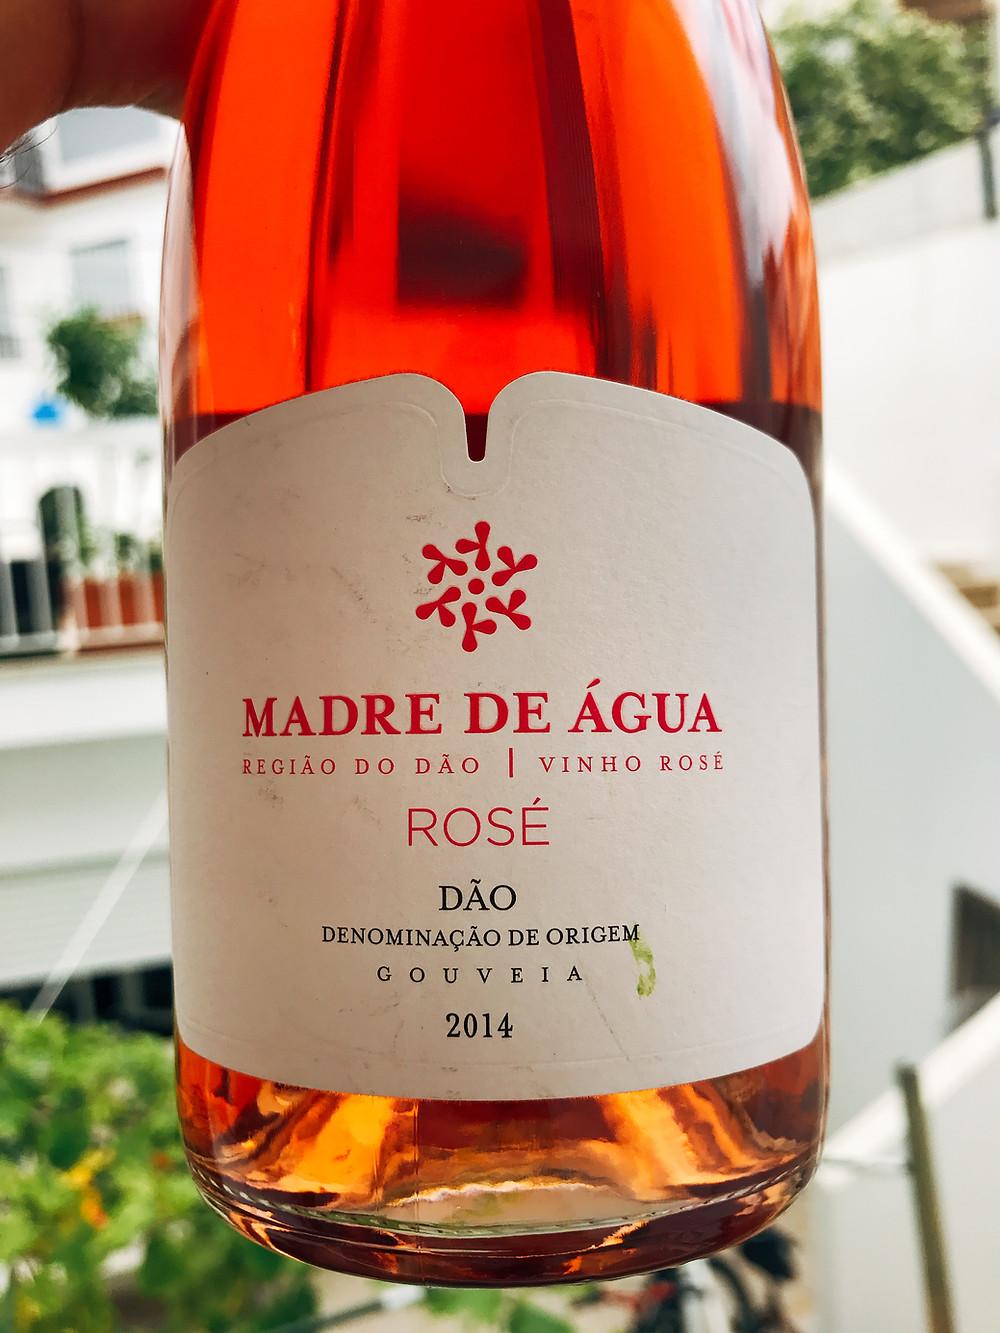 Madre de Água Rosé 2014